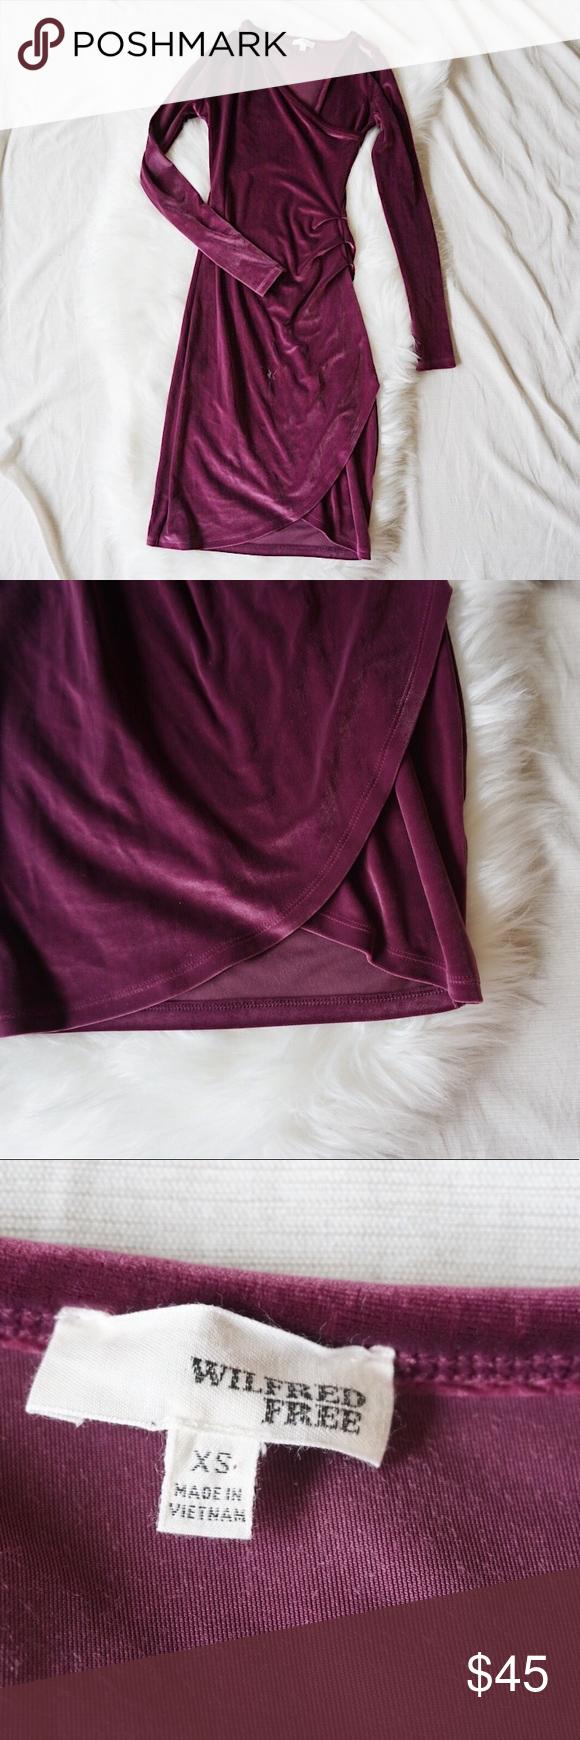 Aritzia wilfred free wine velvet wrap dress xs in my posh